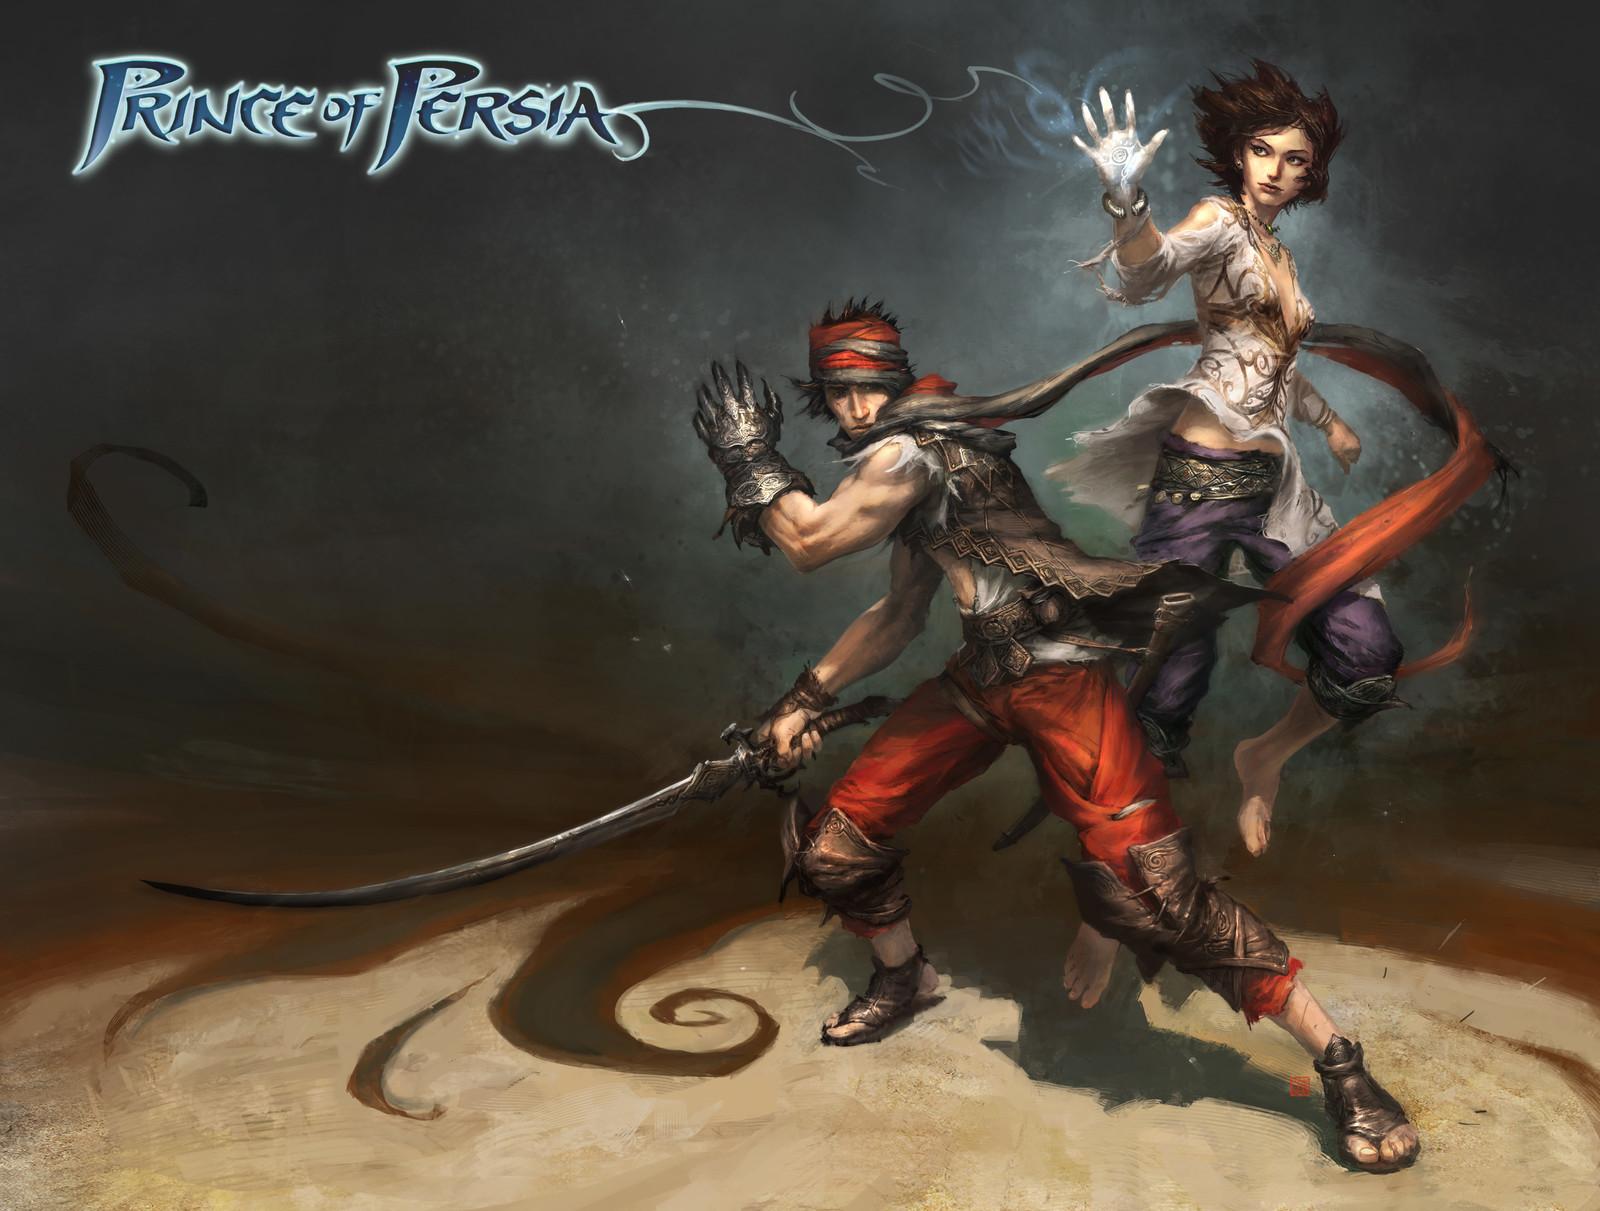 Prince Of Persia ™